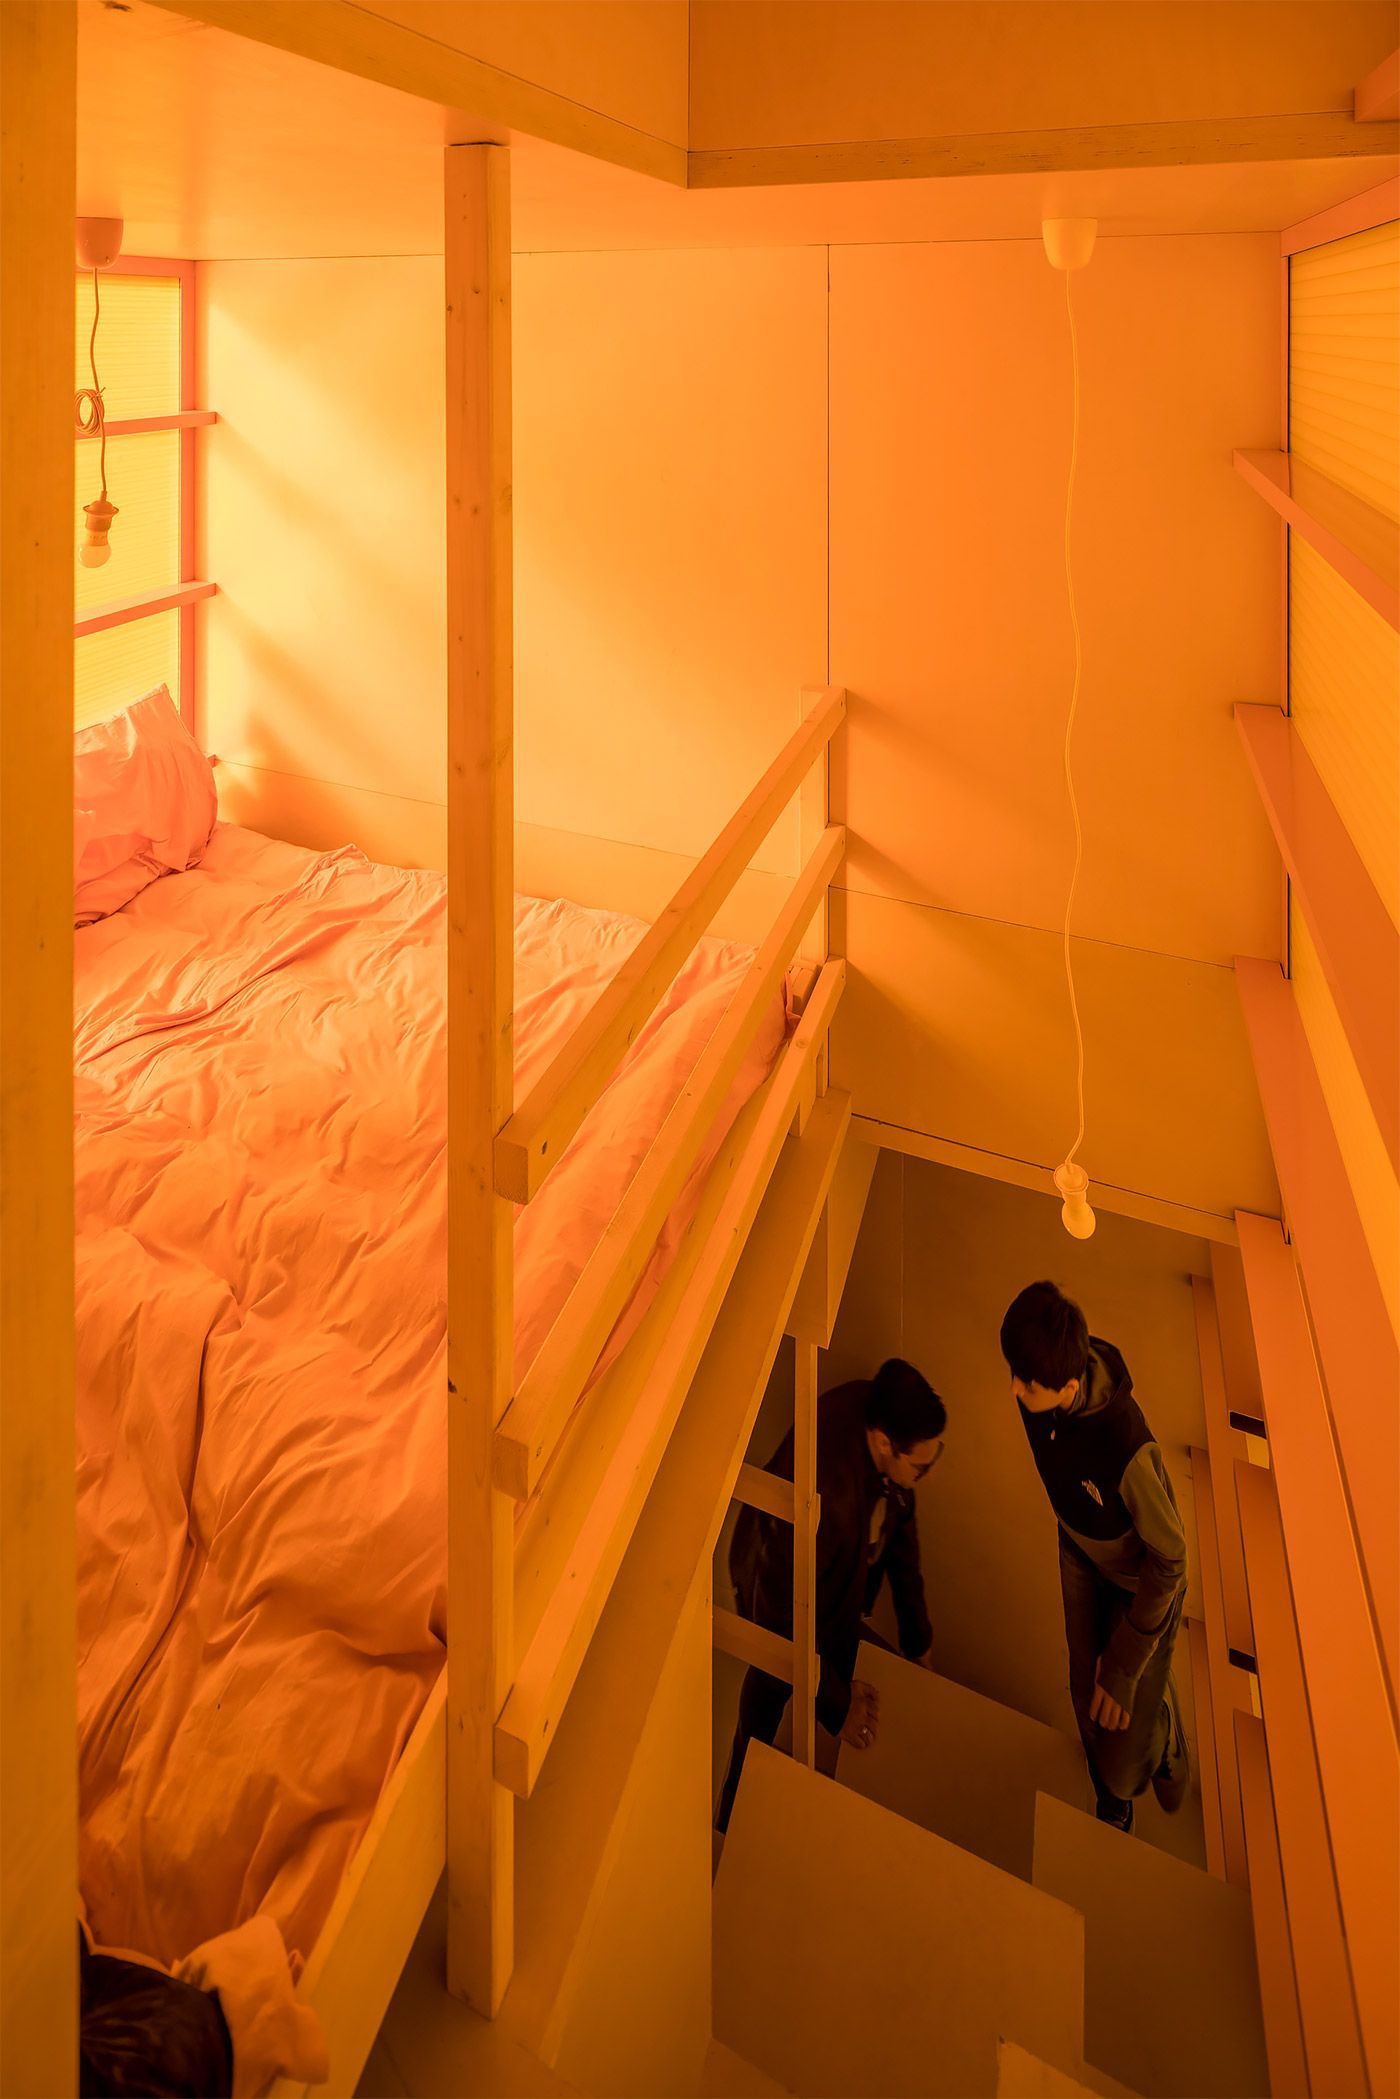 (W)ego Hotel: Concept by MVRDV & The Why Factory – Inspiration Grid | Design Inspiration #architecture #art #artinstallation #building #hotel #inspirationgrid